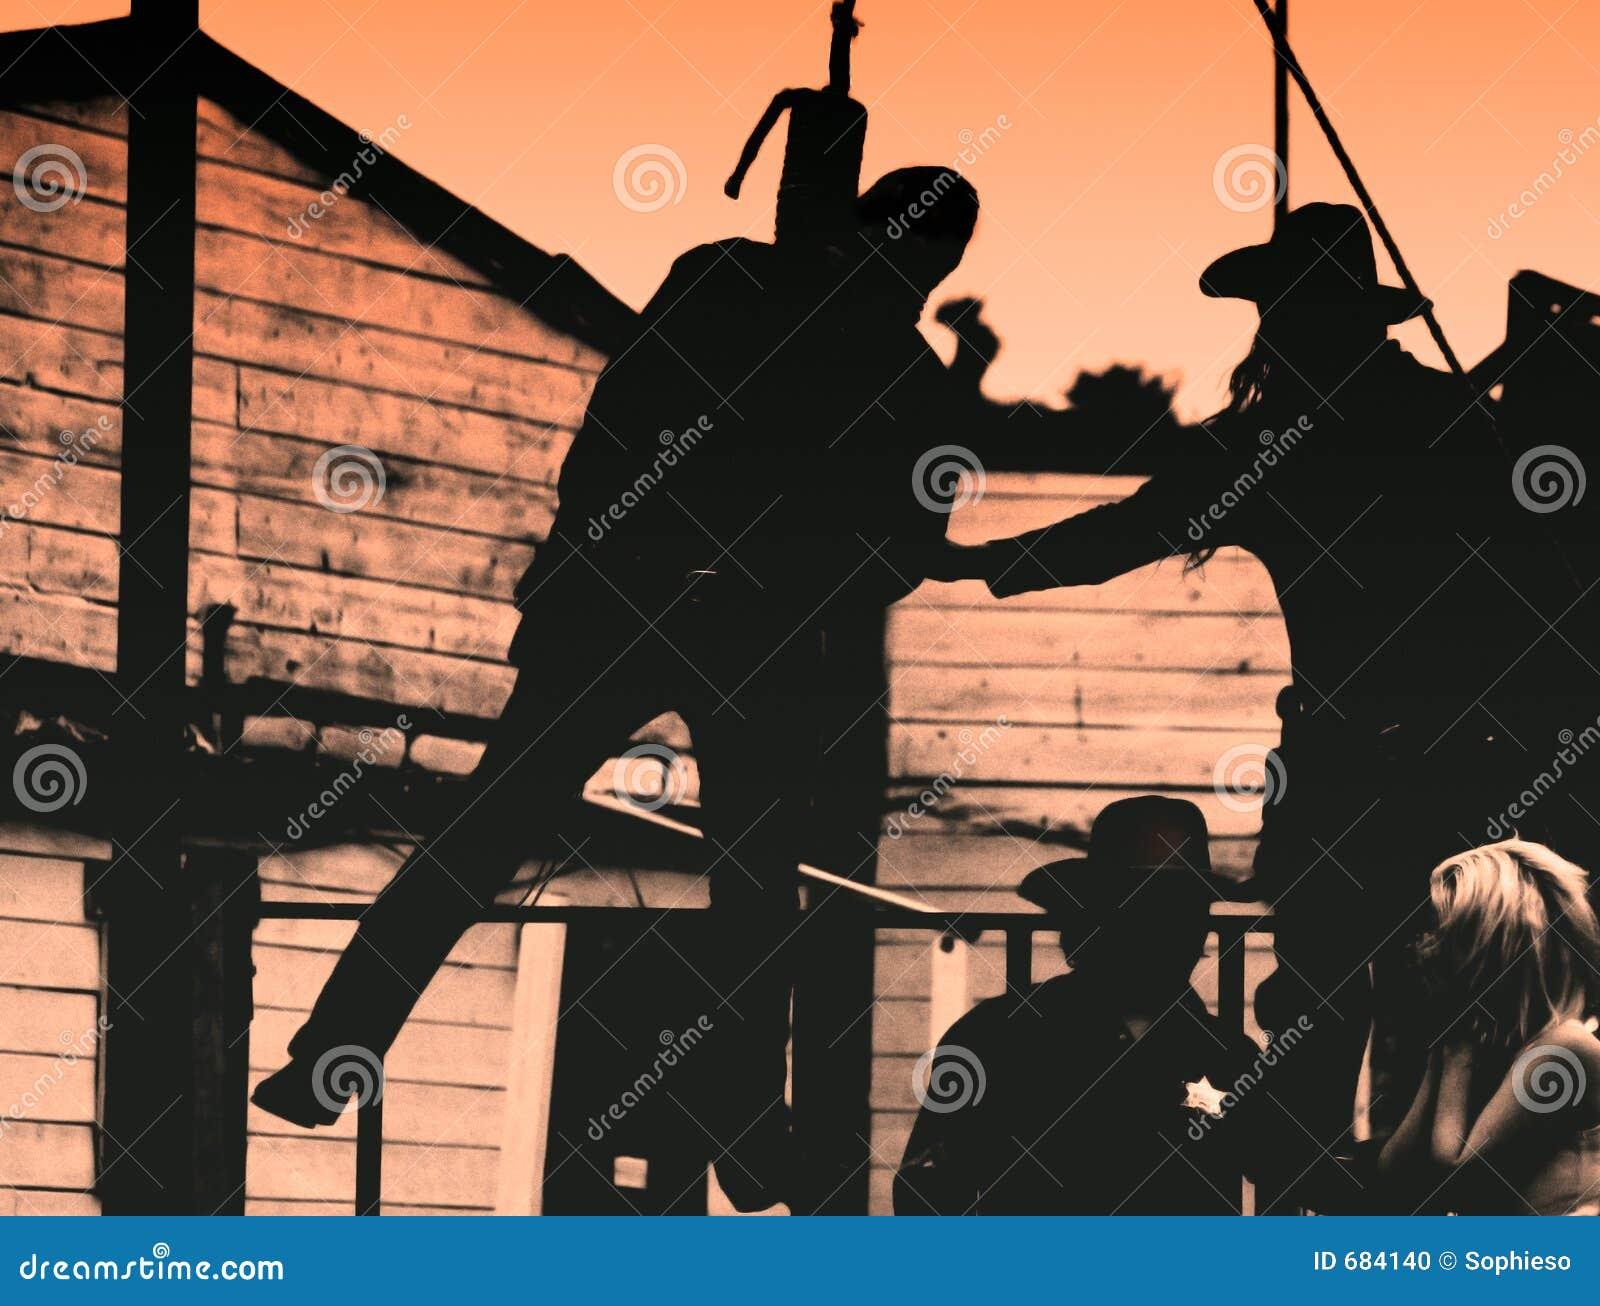 Viejo Oeste-Proscriba cuelga